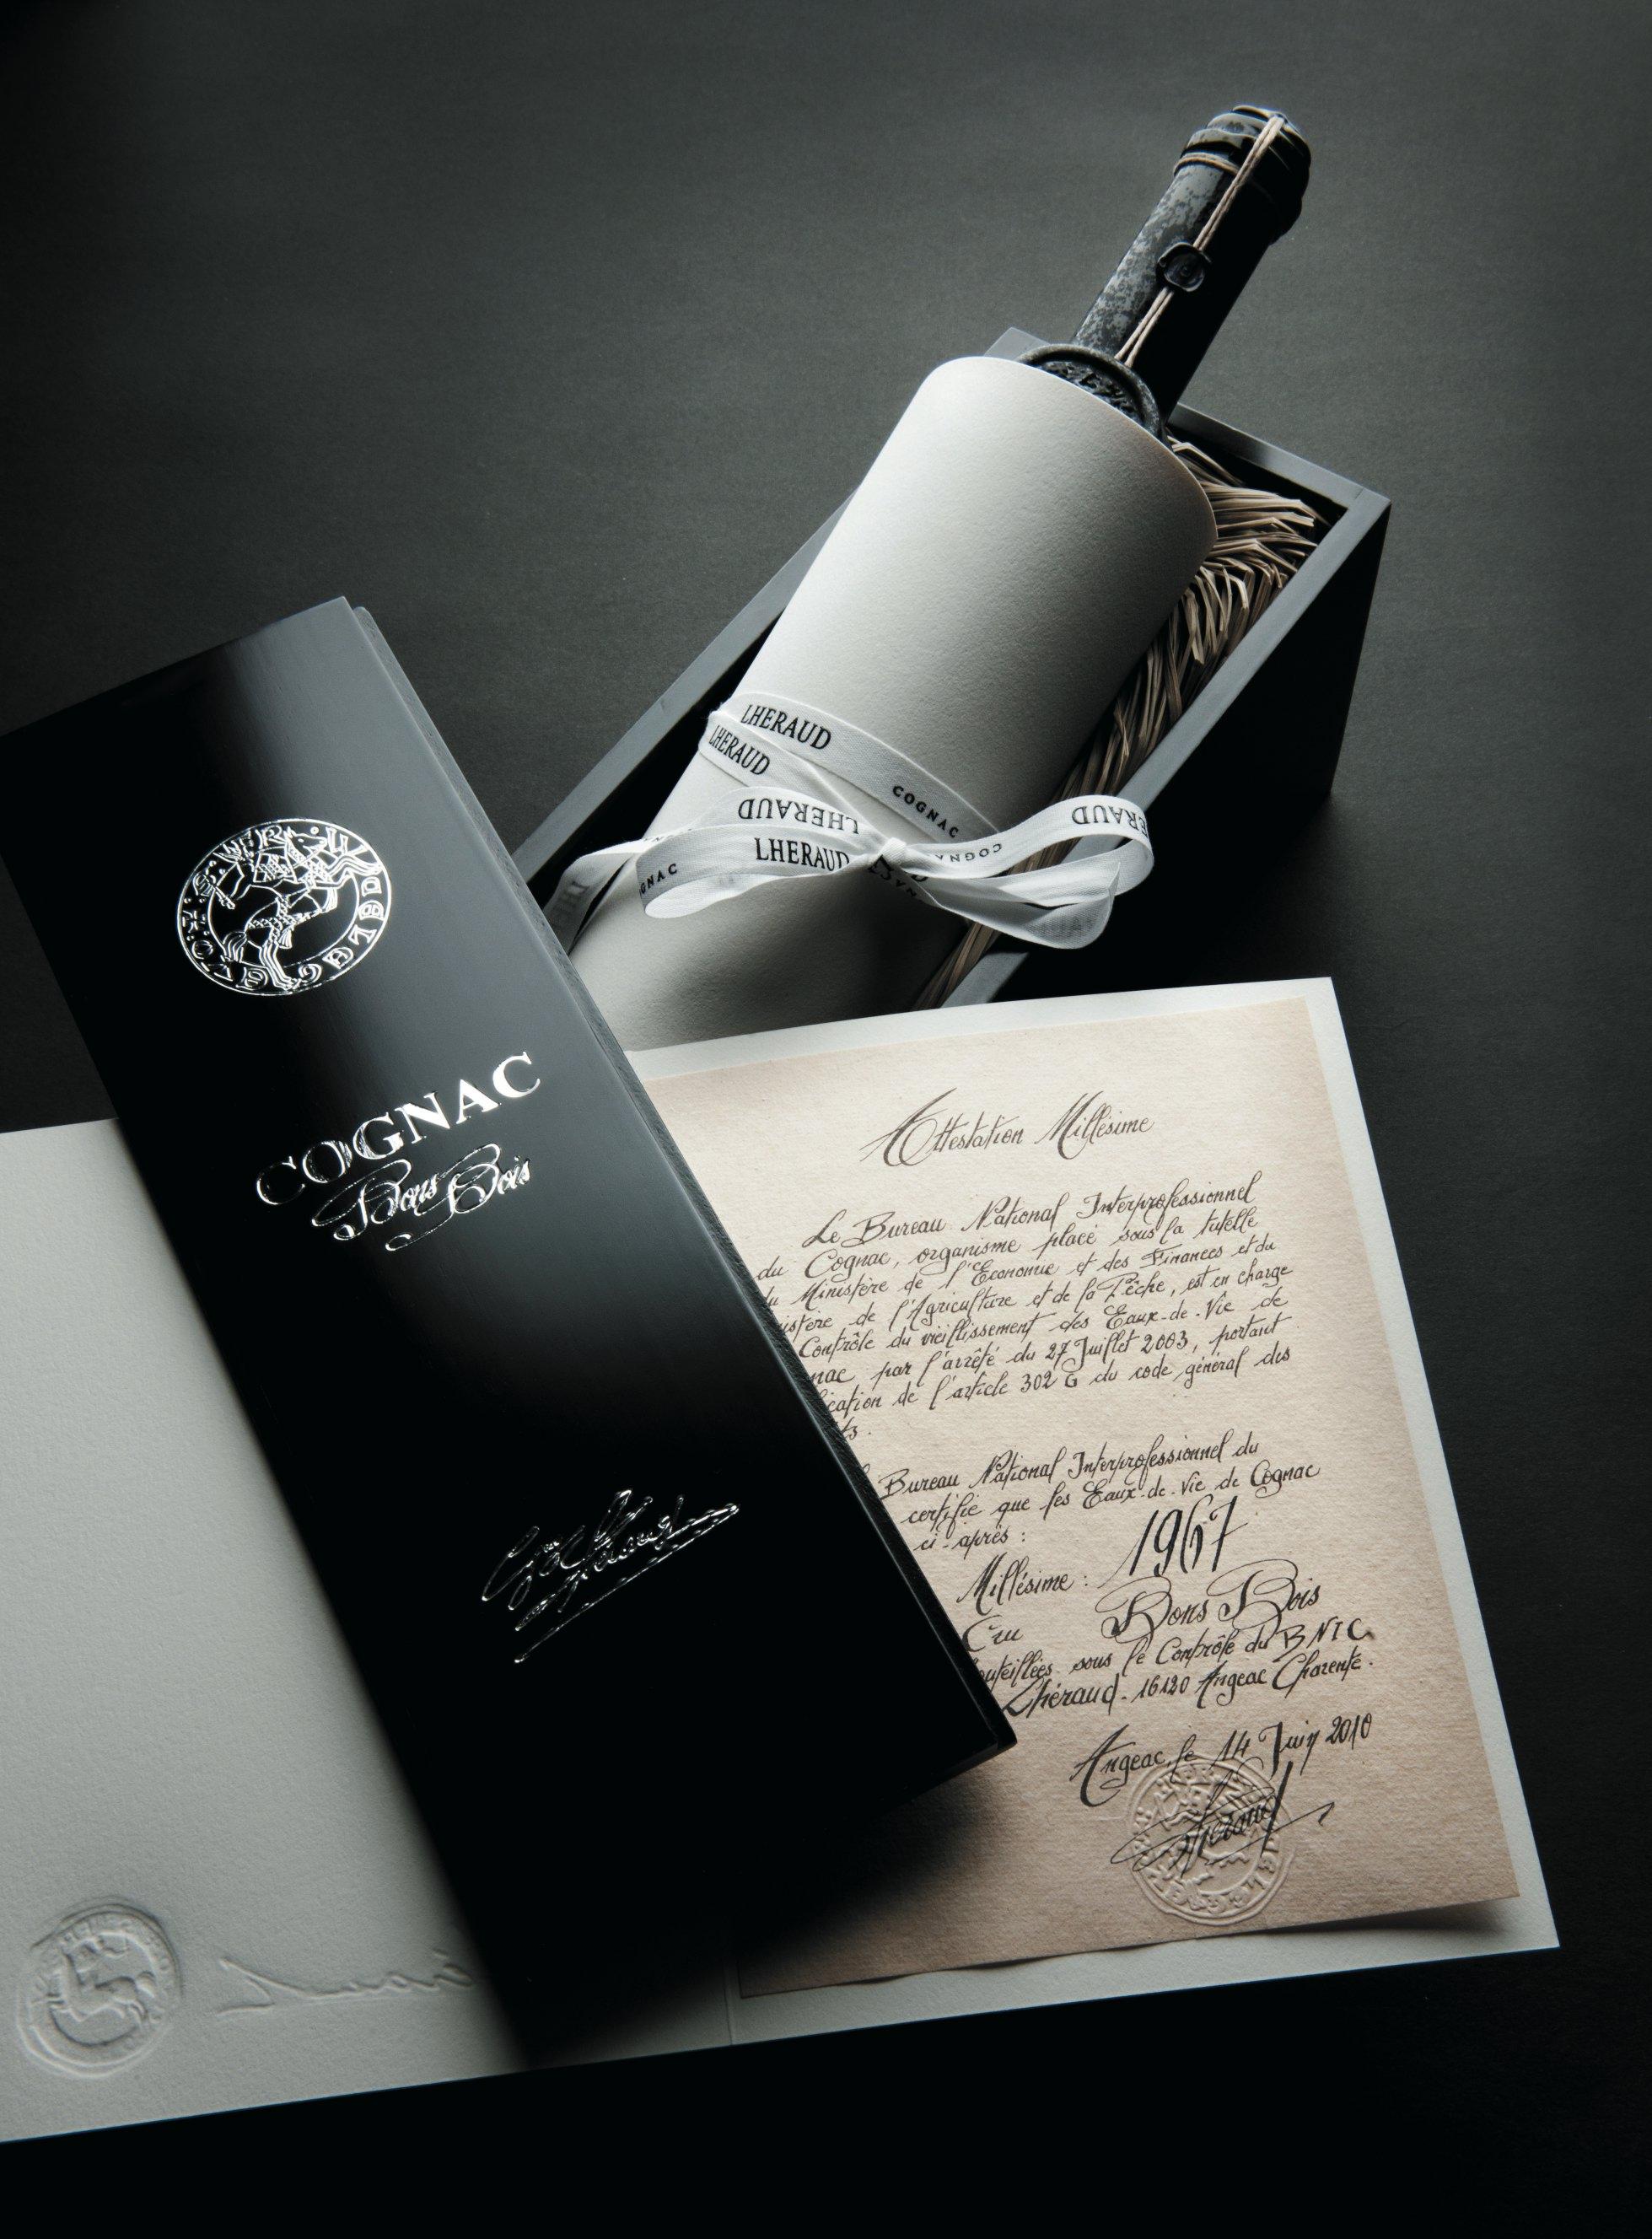 Diner Cognac Lheraud.